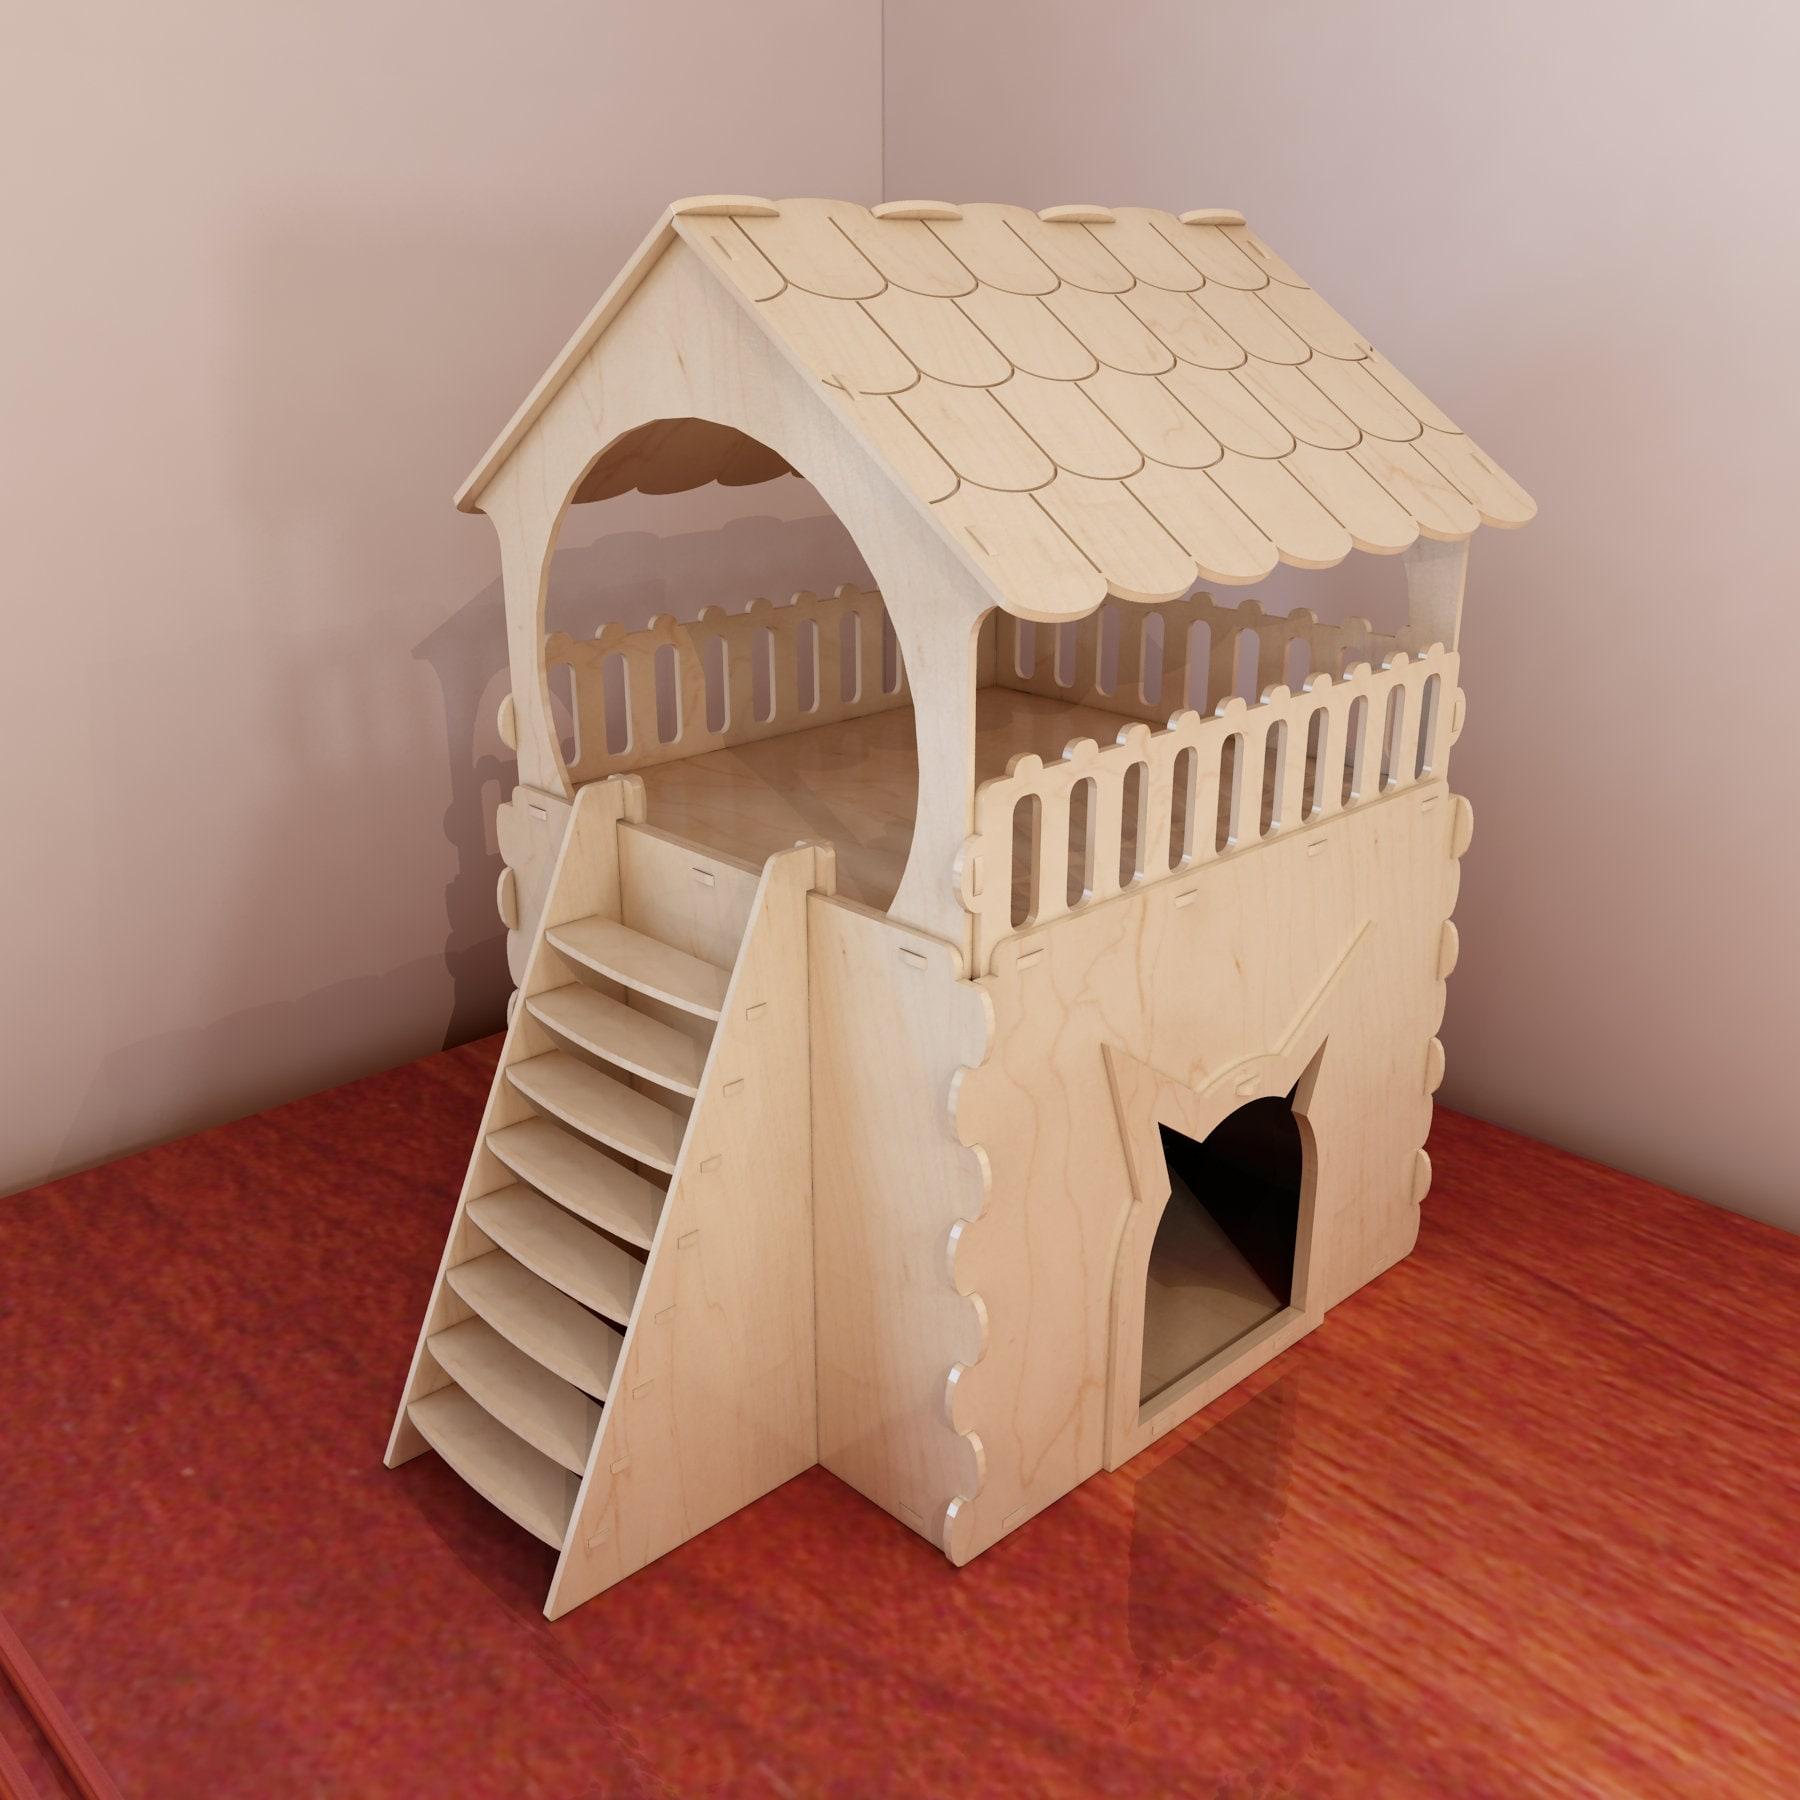 gro e katze hauspl ne f r cnc fr se und laserschneiden holz. Black Bedroom Furniture Sets. Home Design Ideas